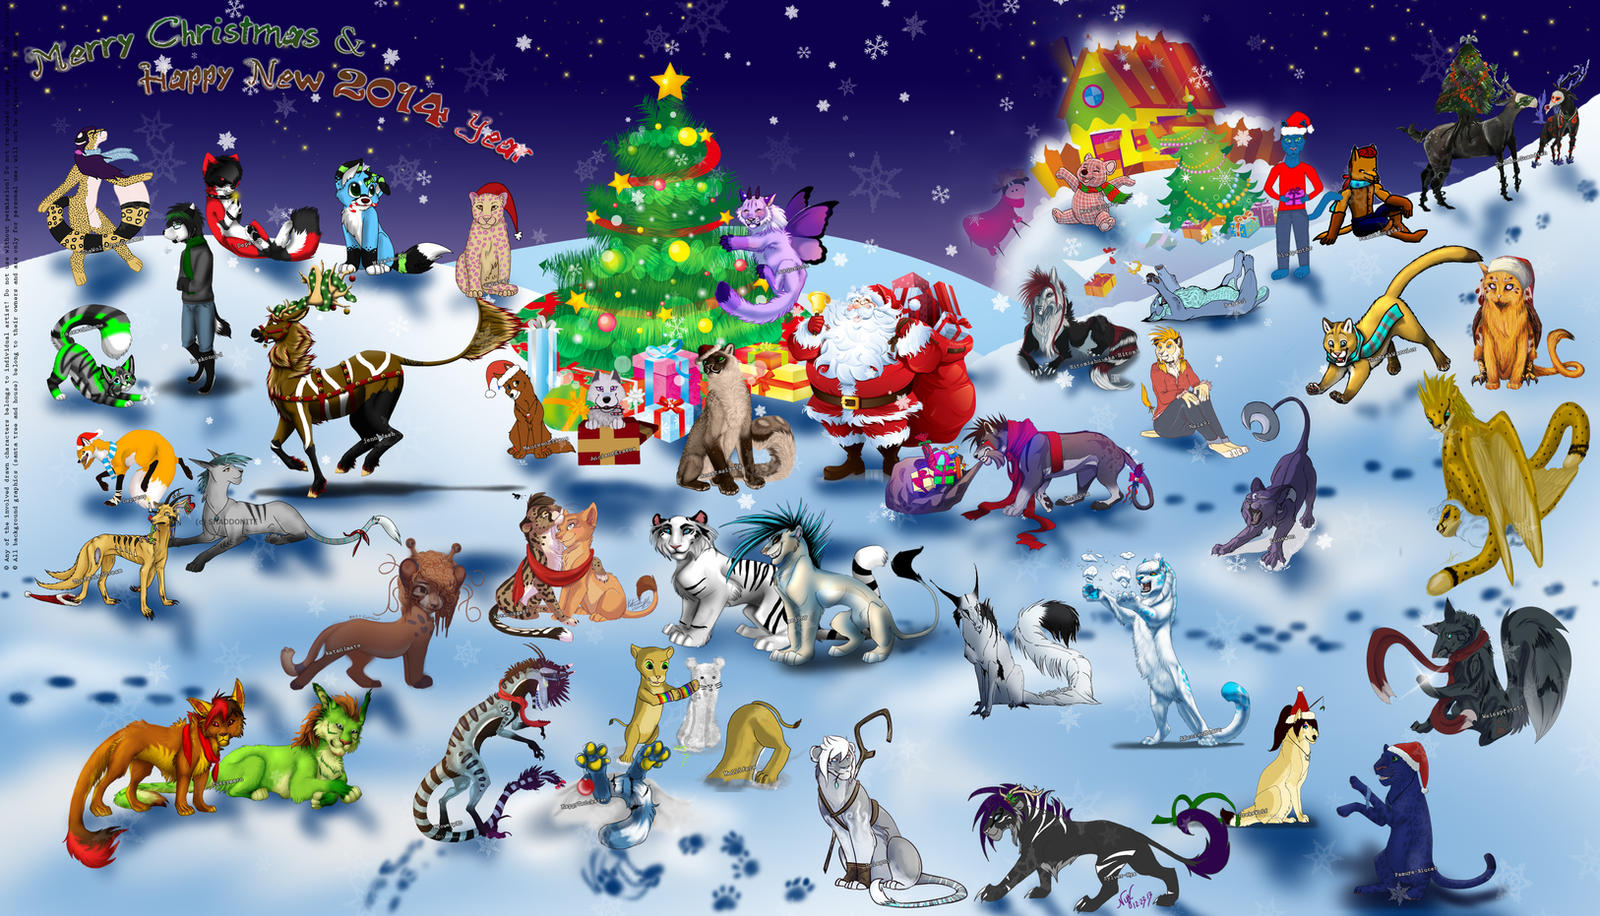 Christmas COLLAB 2013 by JonyRichardson